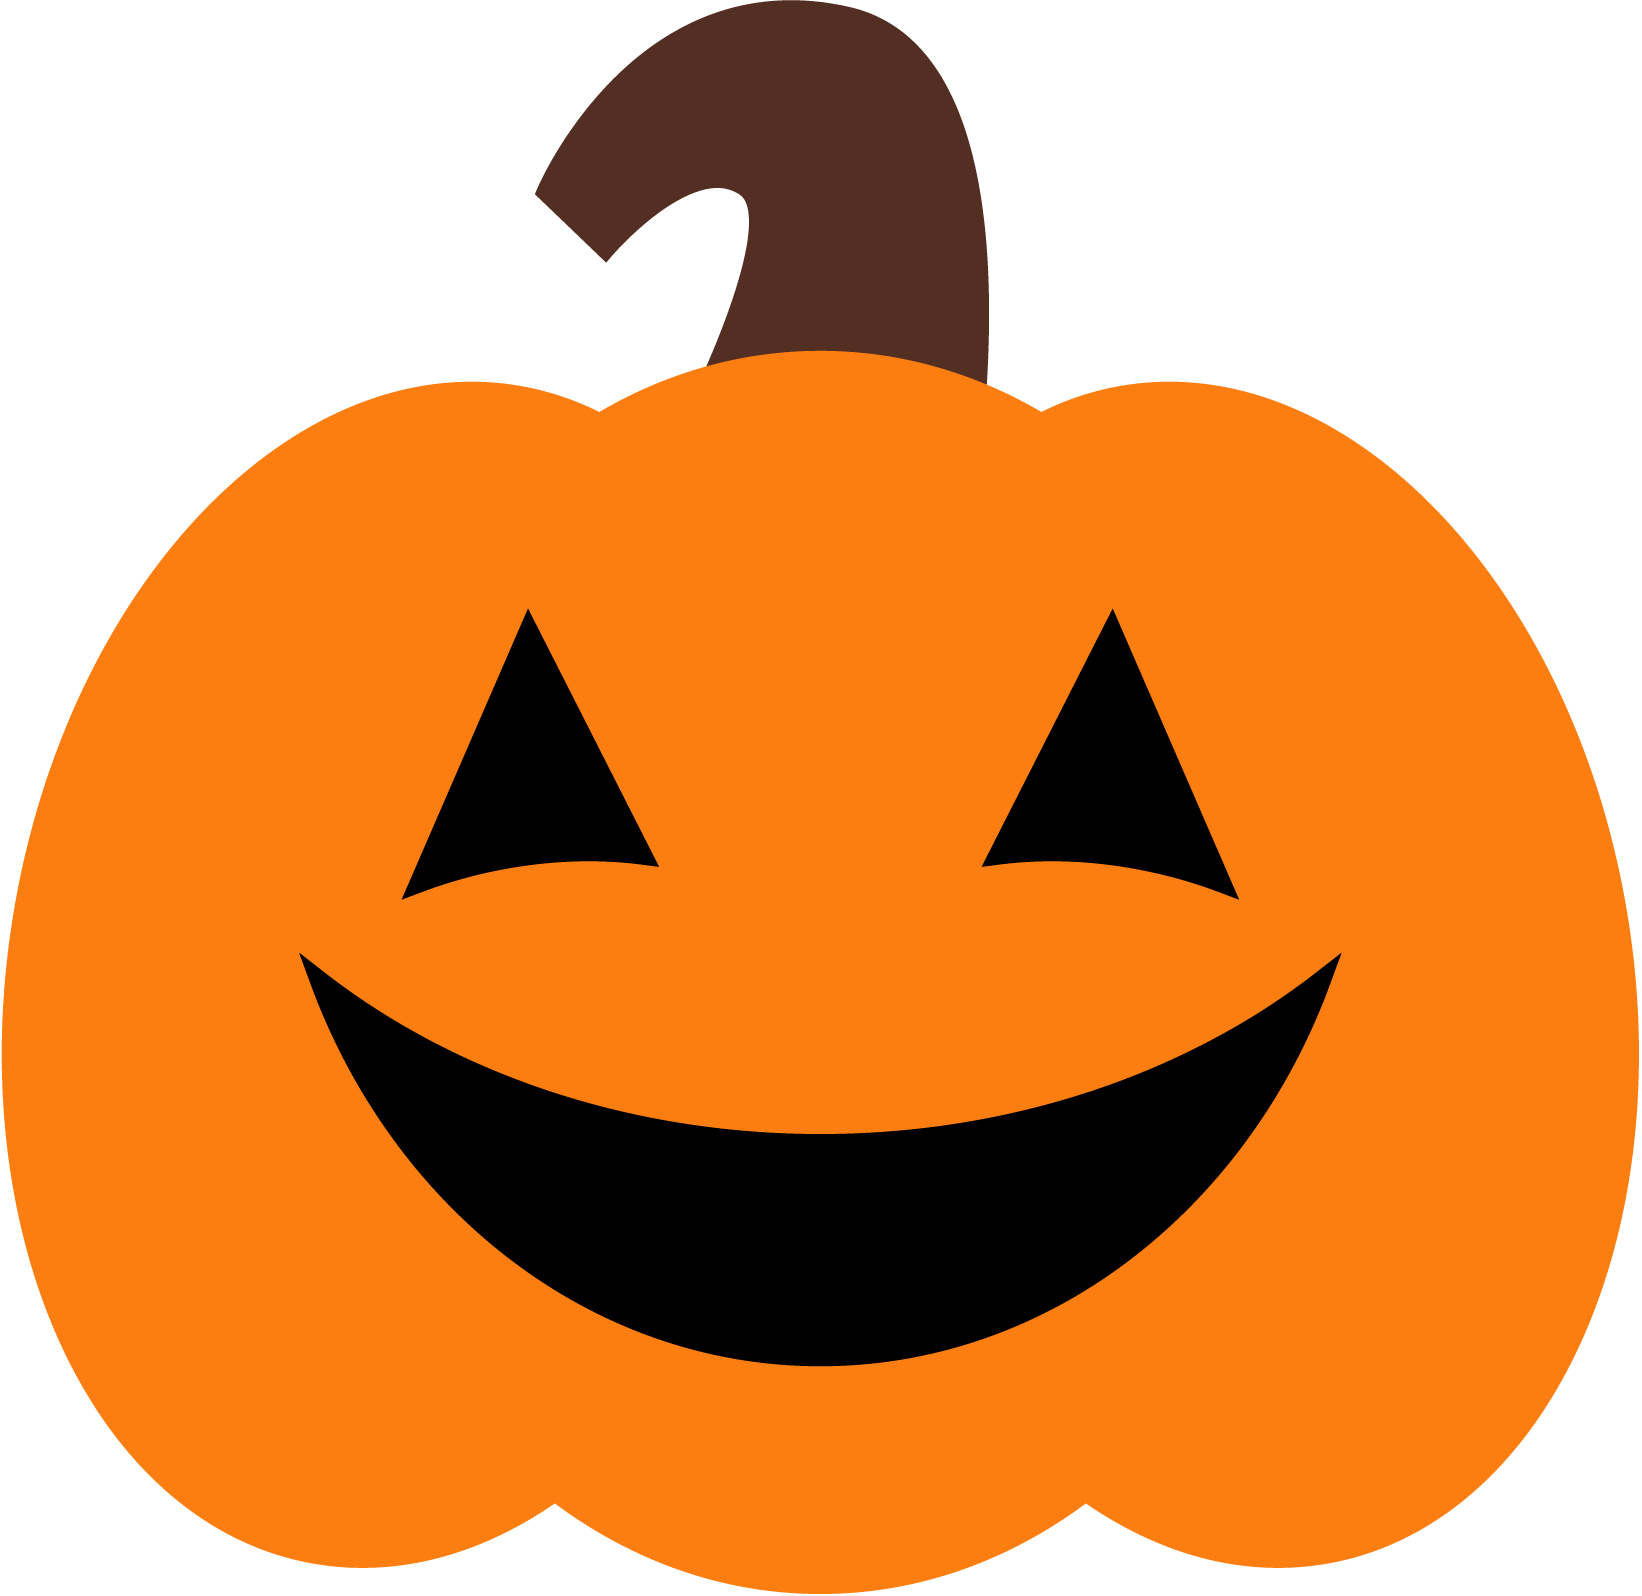 revideviJackOLantern - Halloween Clipart